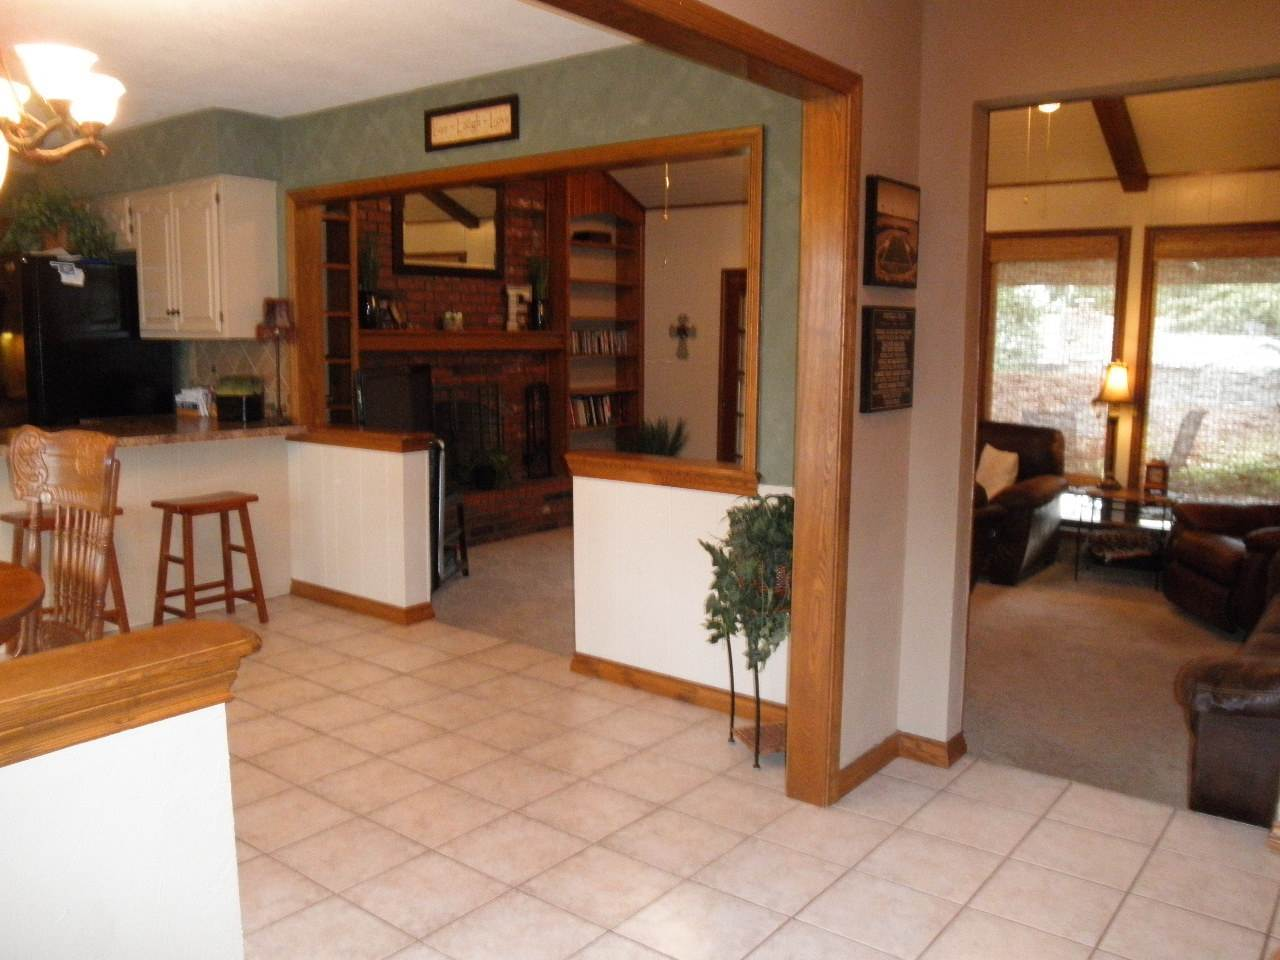 Sold Cross Sale W/ MLS | 2805 Ames  Ponca City, OK  7